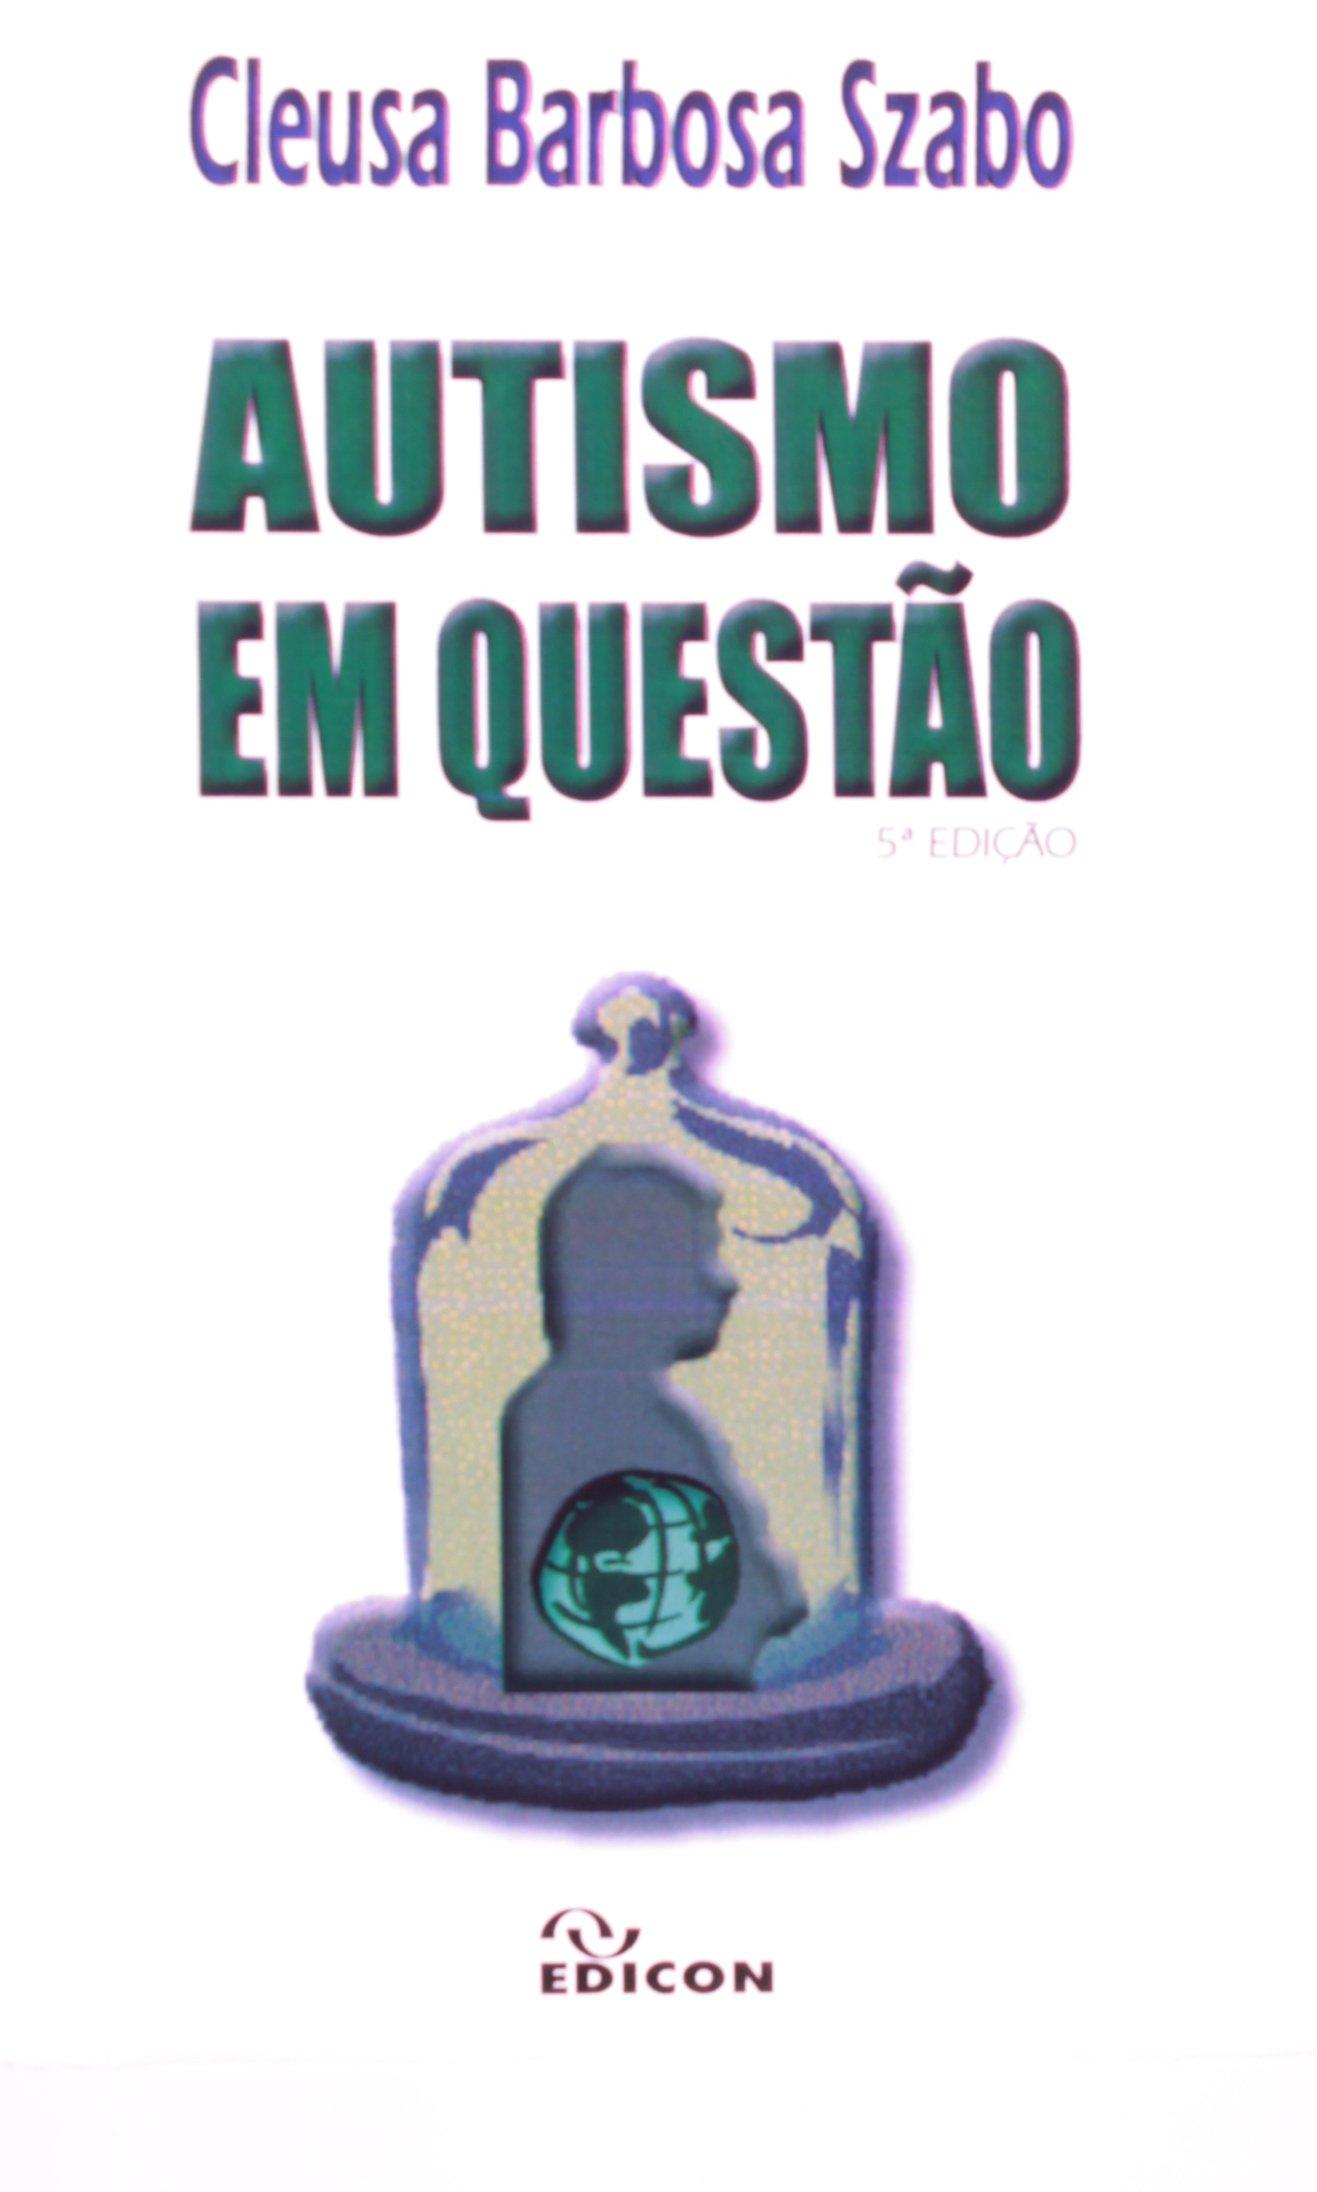 Autismo Em Questao ebook